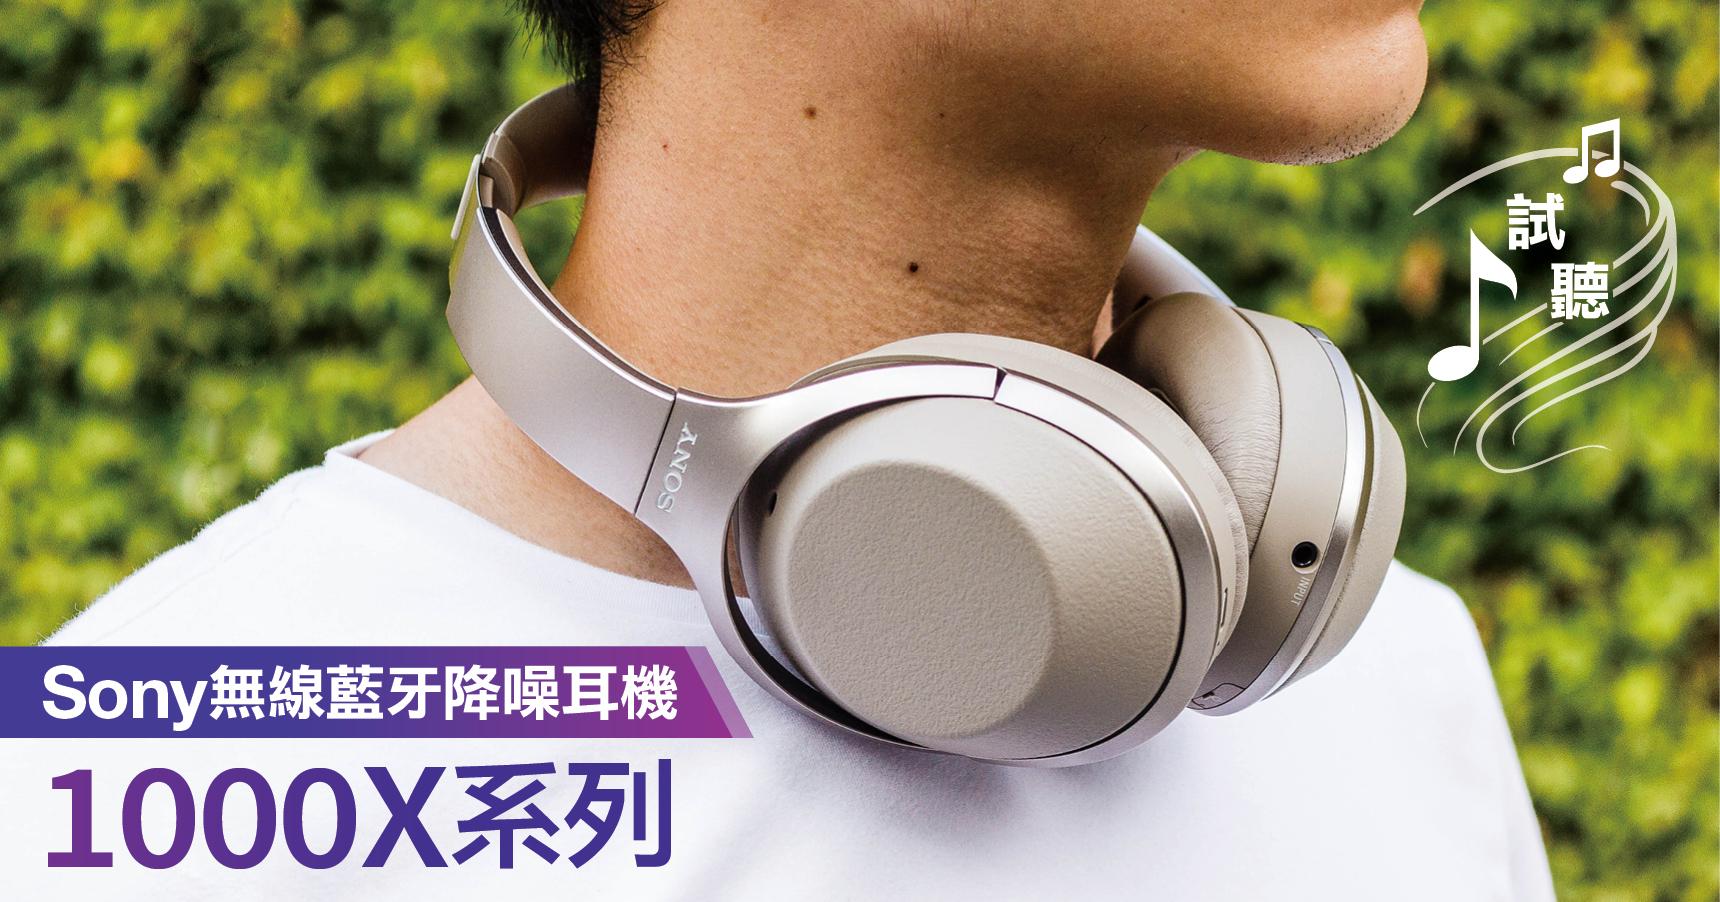 Sony 1000X 系列無線藍牙降噪耳機搶先聽:以降噪優化和自動降噪/環境音模式轉換引領降噪新境界!